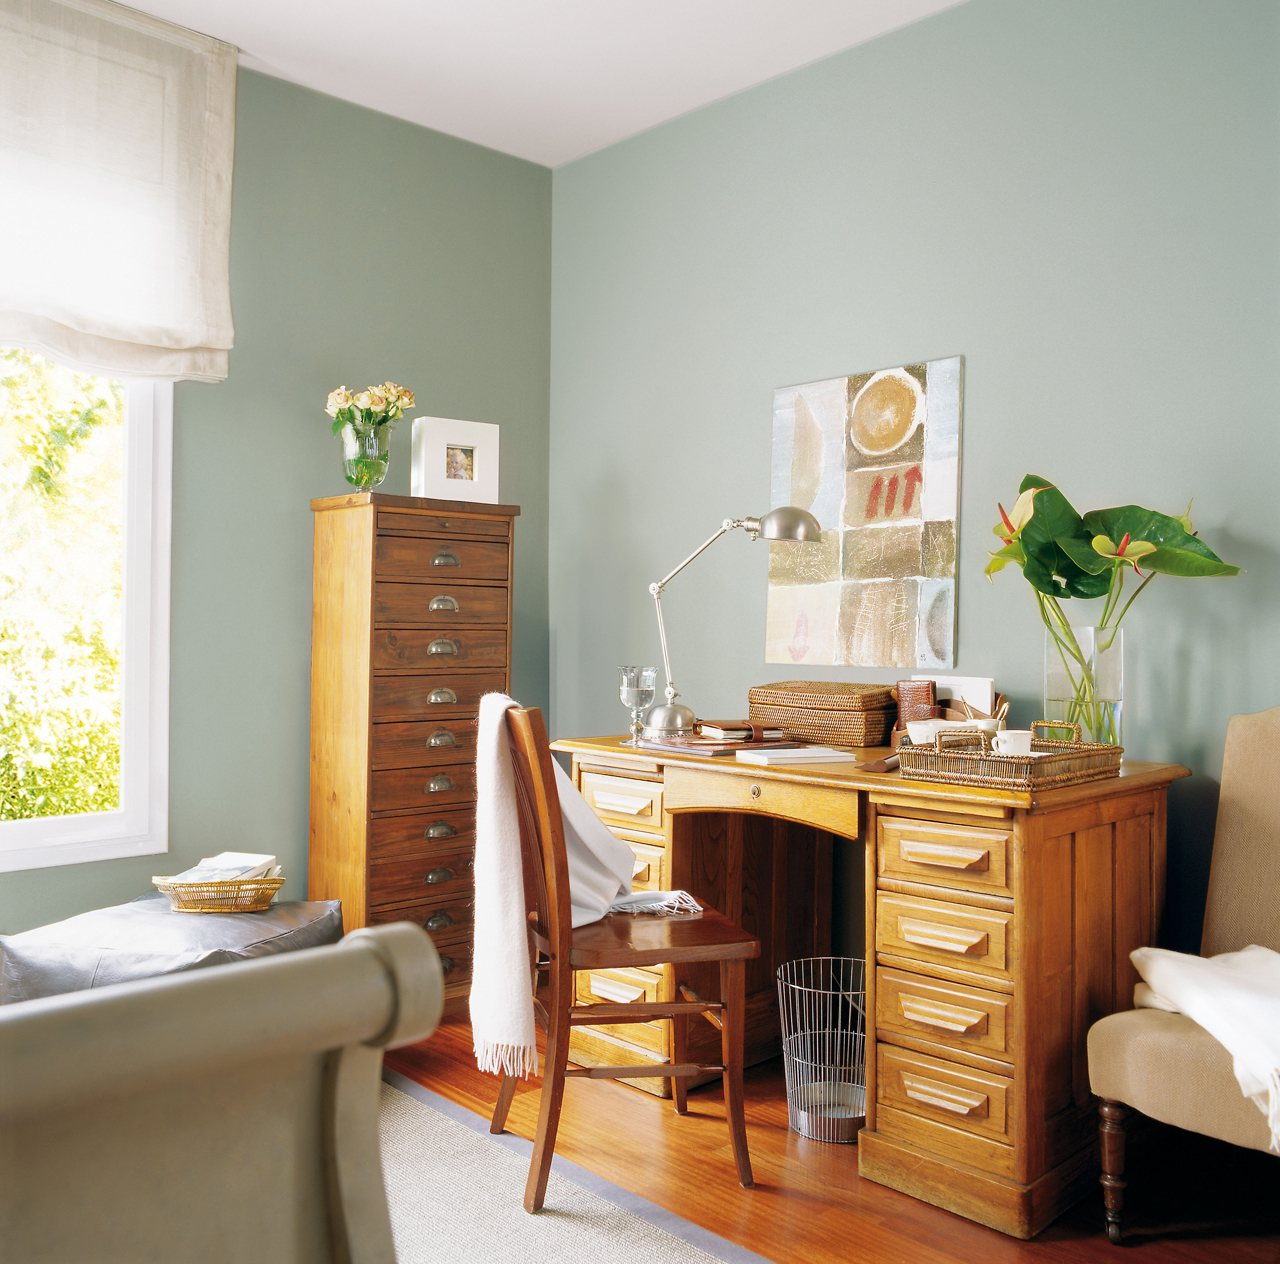 Muebles de roble restaurados for Muebles de roble